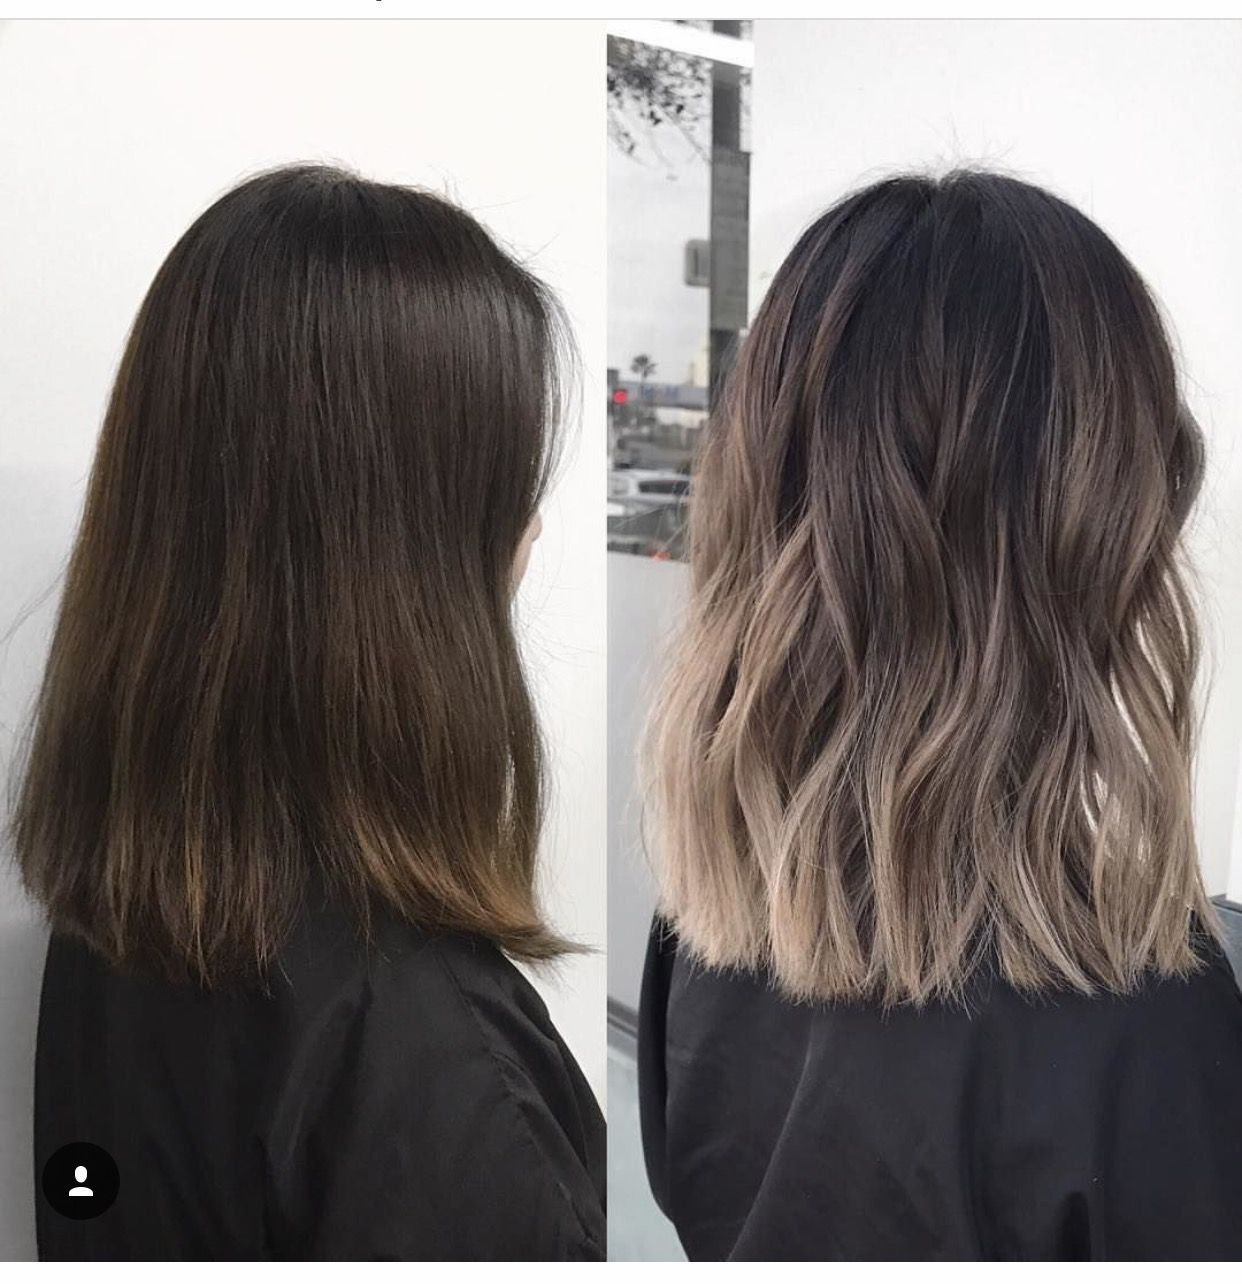 Straight Dark Brown Highlighted Hairstyle Hair Highlights Brown Blonde Hair Hair Styles